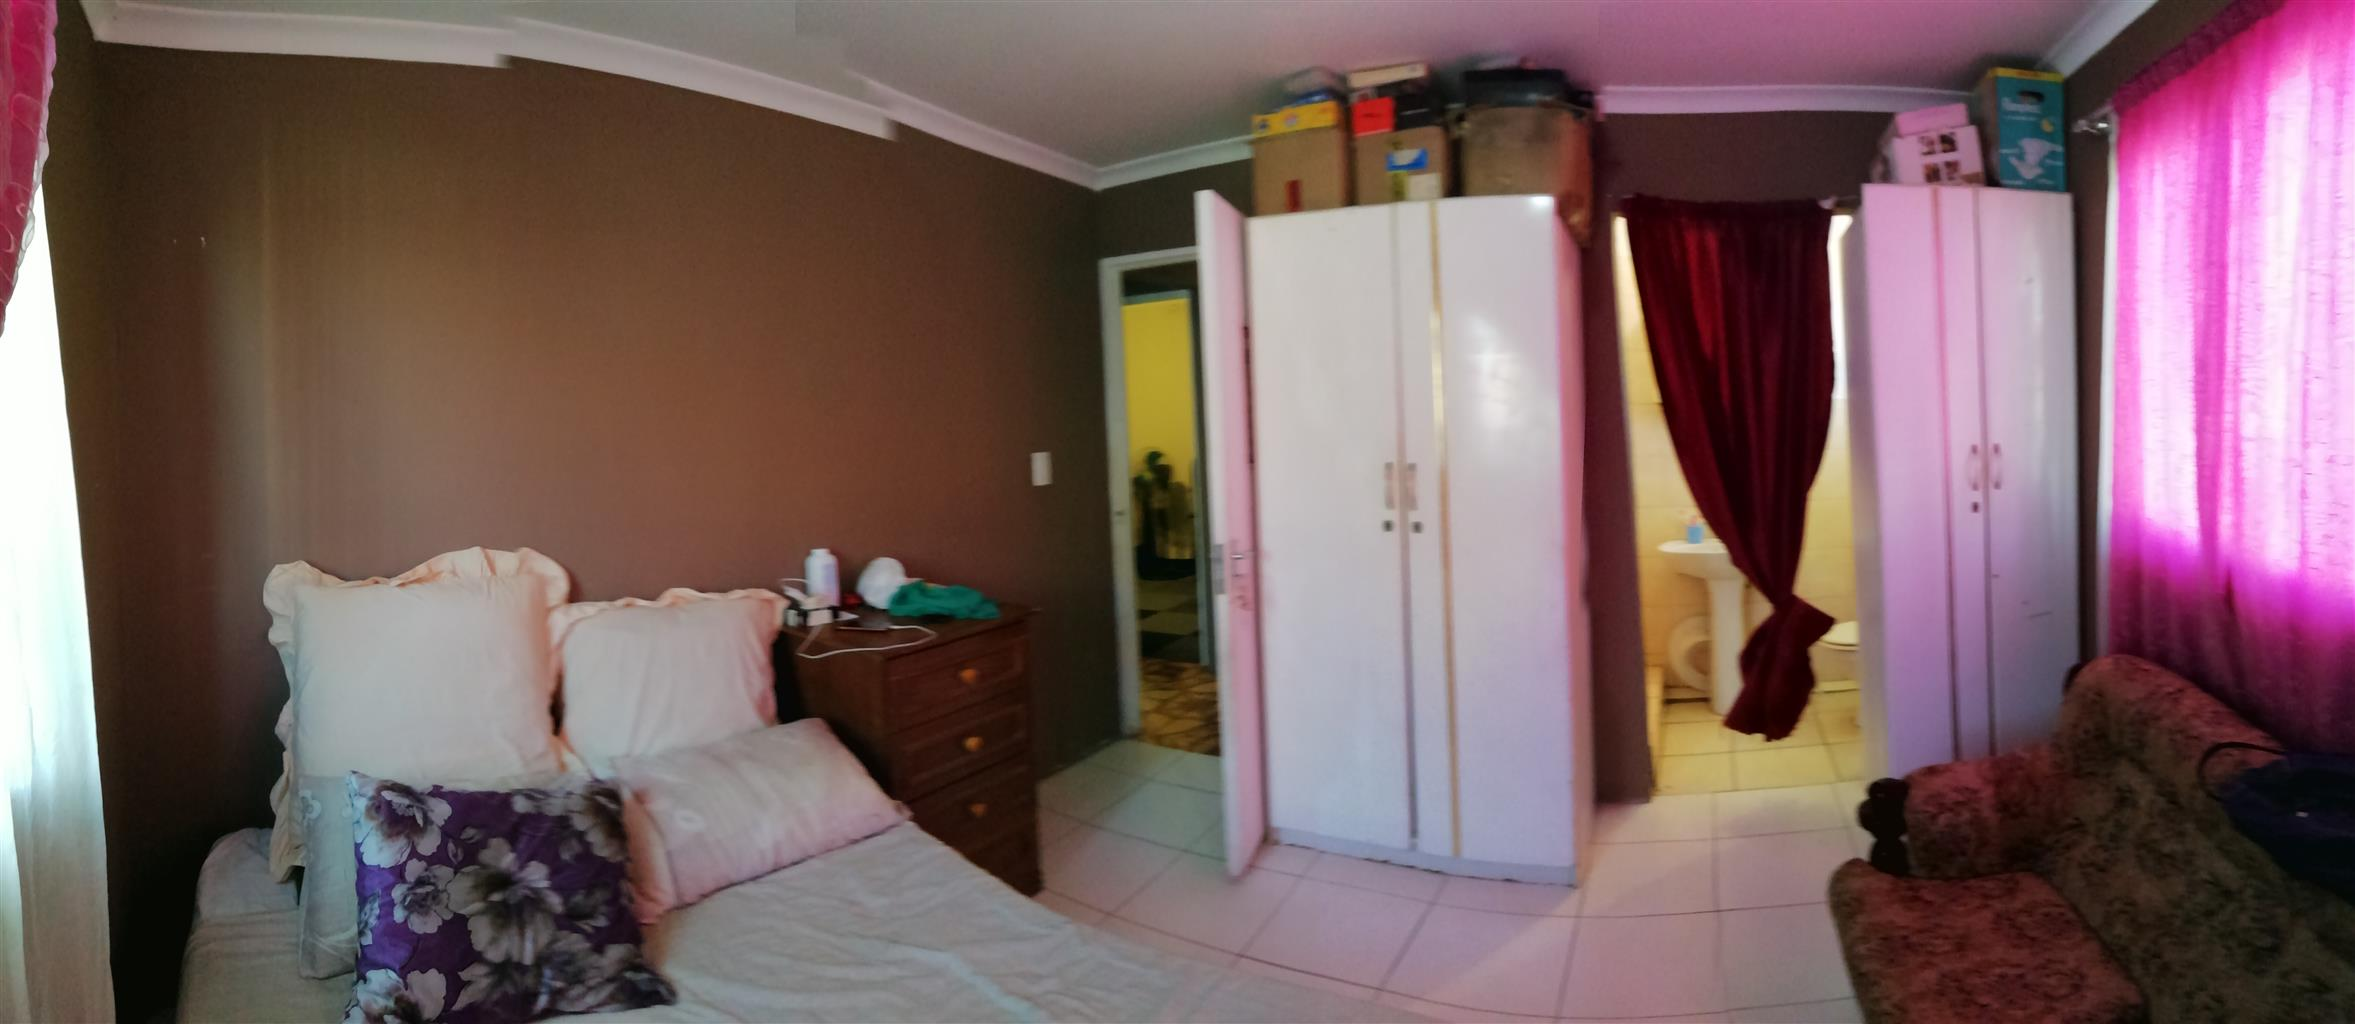 Verulam - 3 beds free standing property